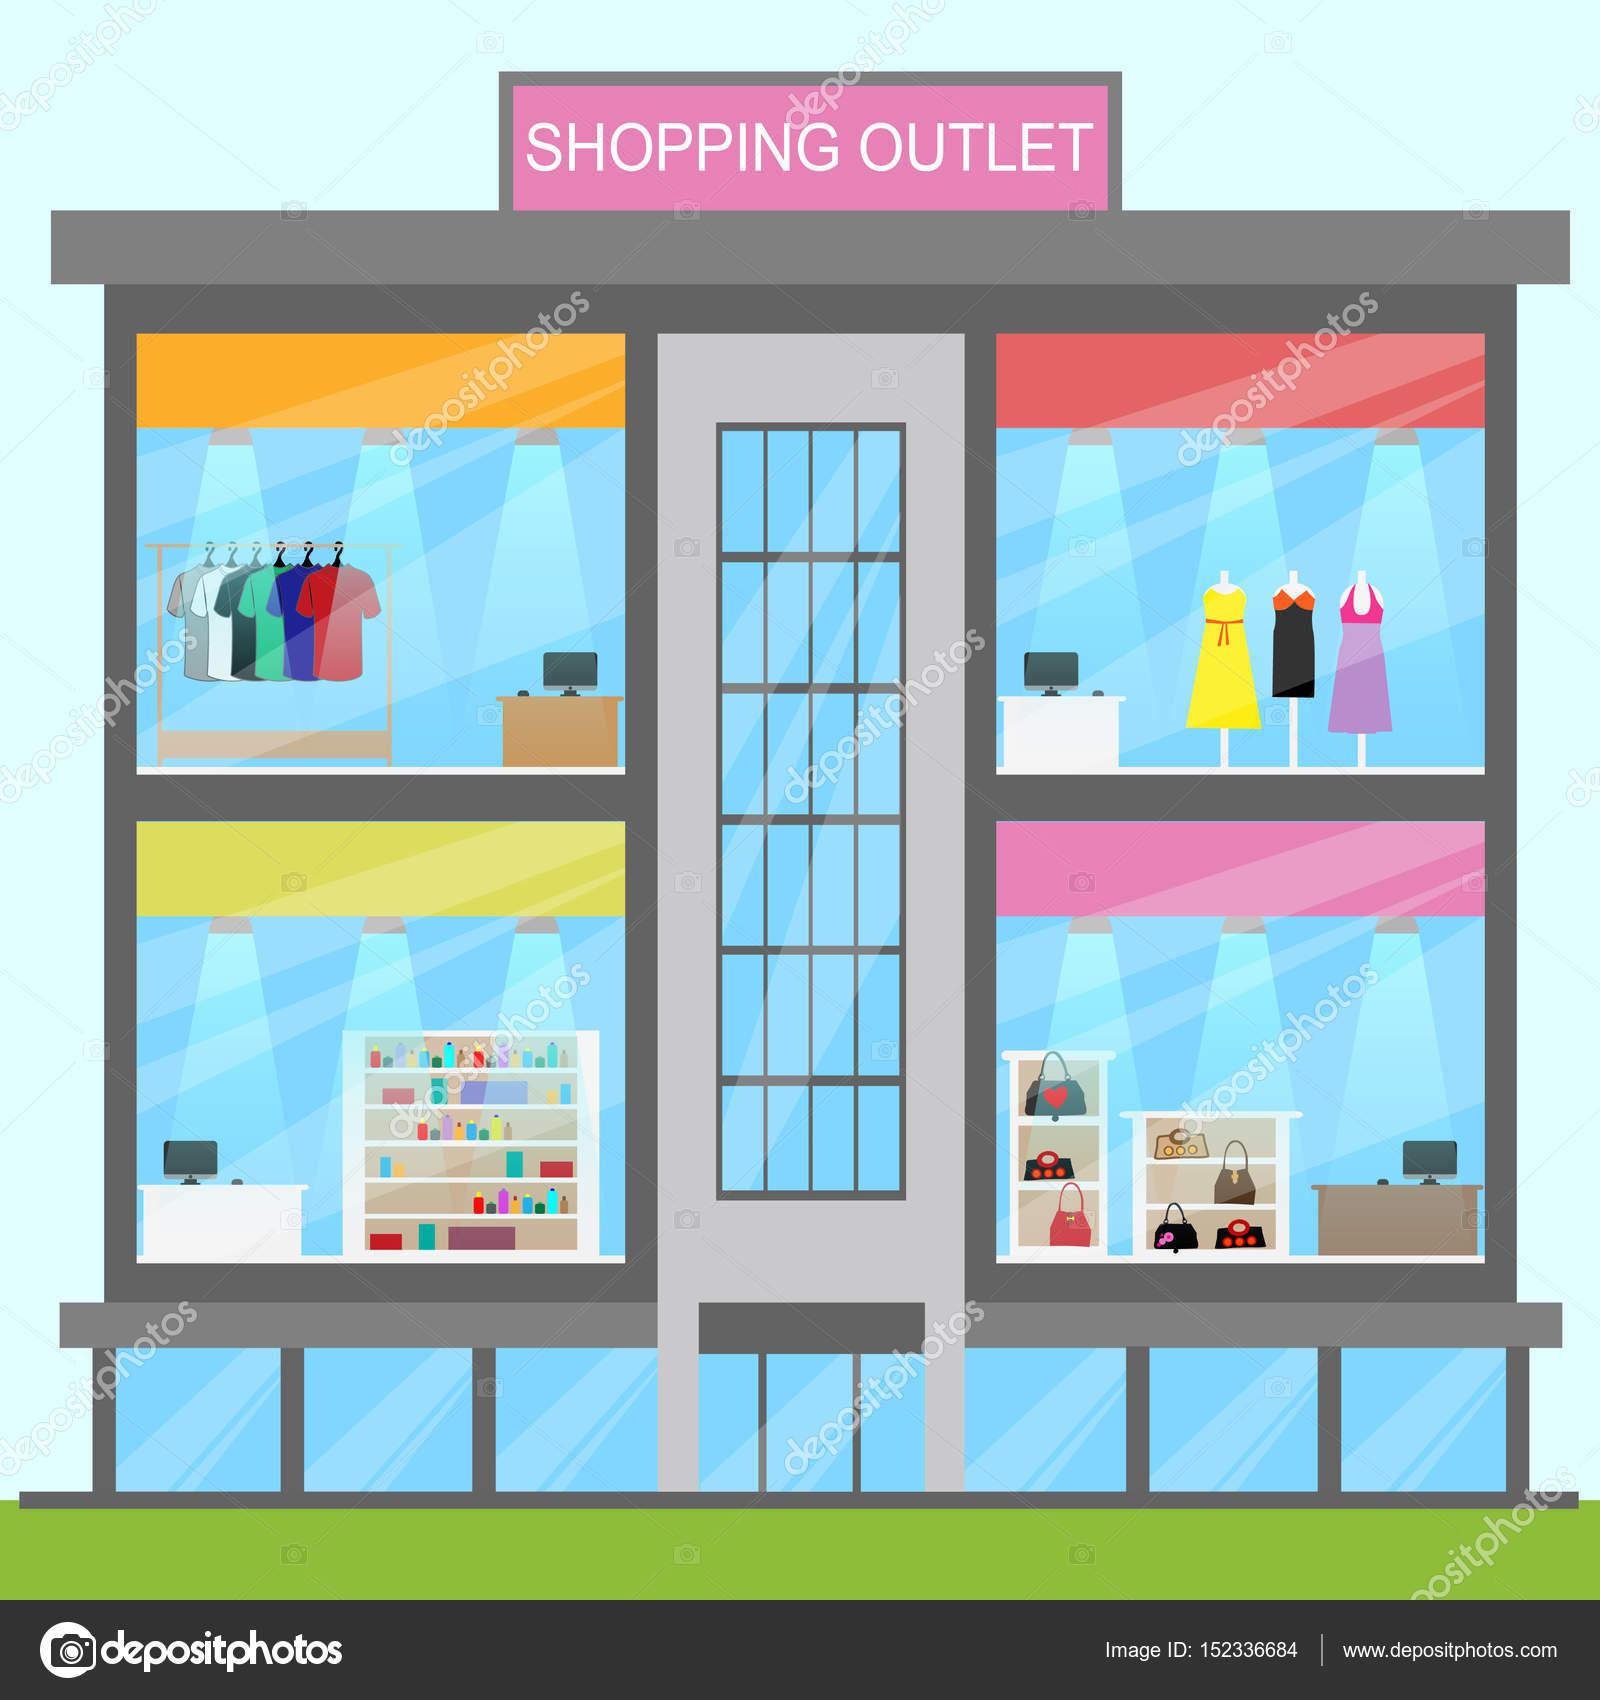 Shopping Outlet Means Retail Commerce 3d Illustration